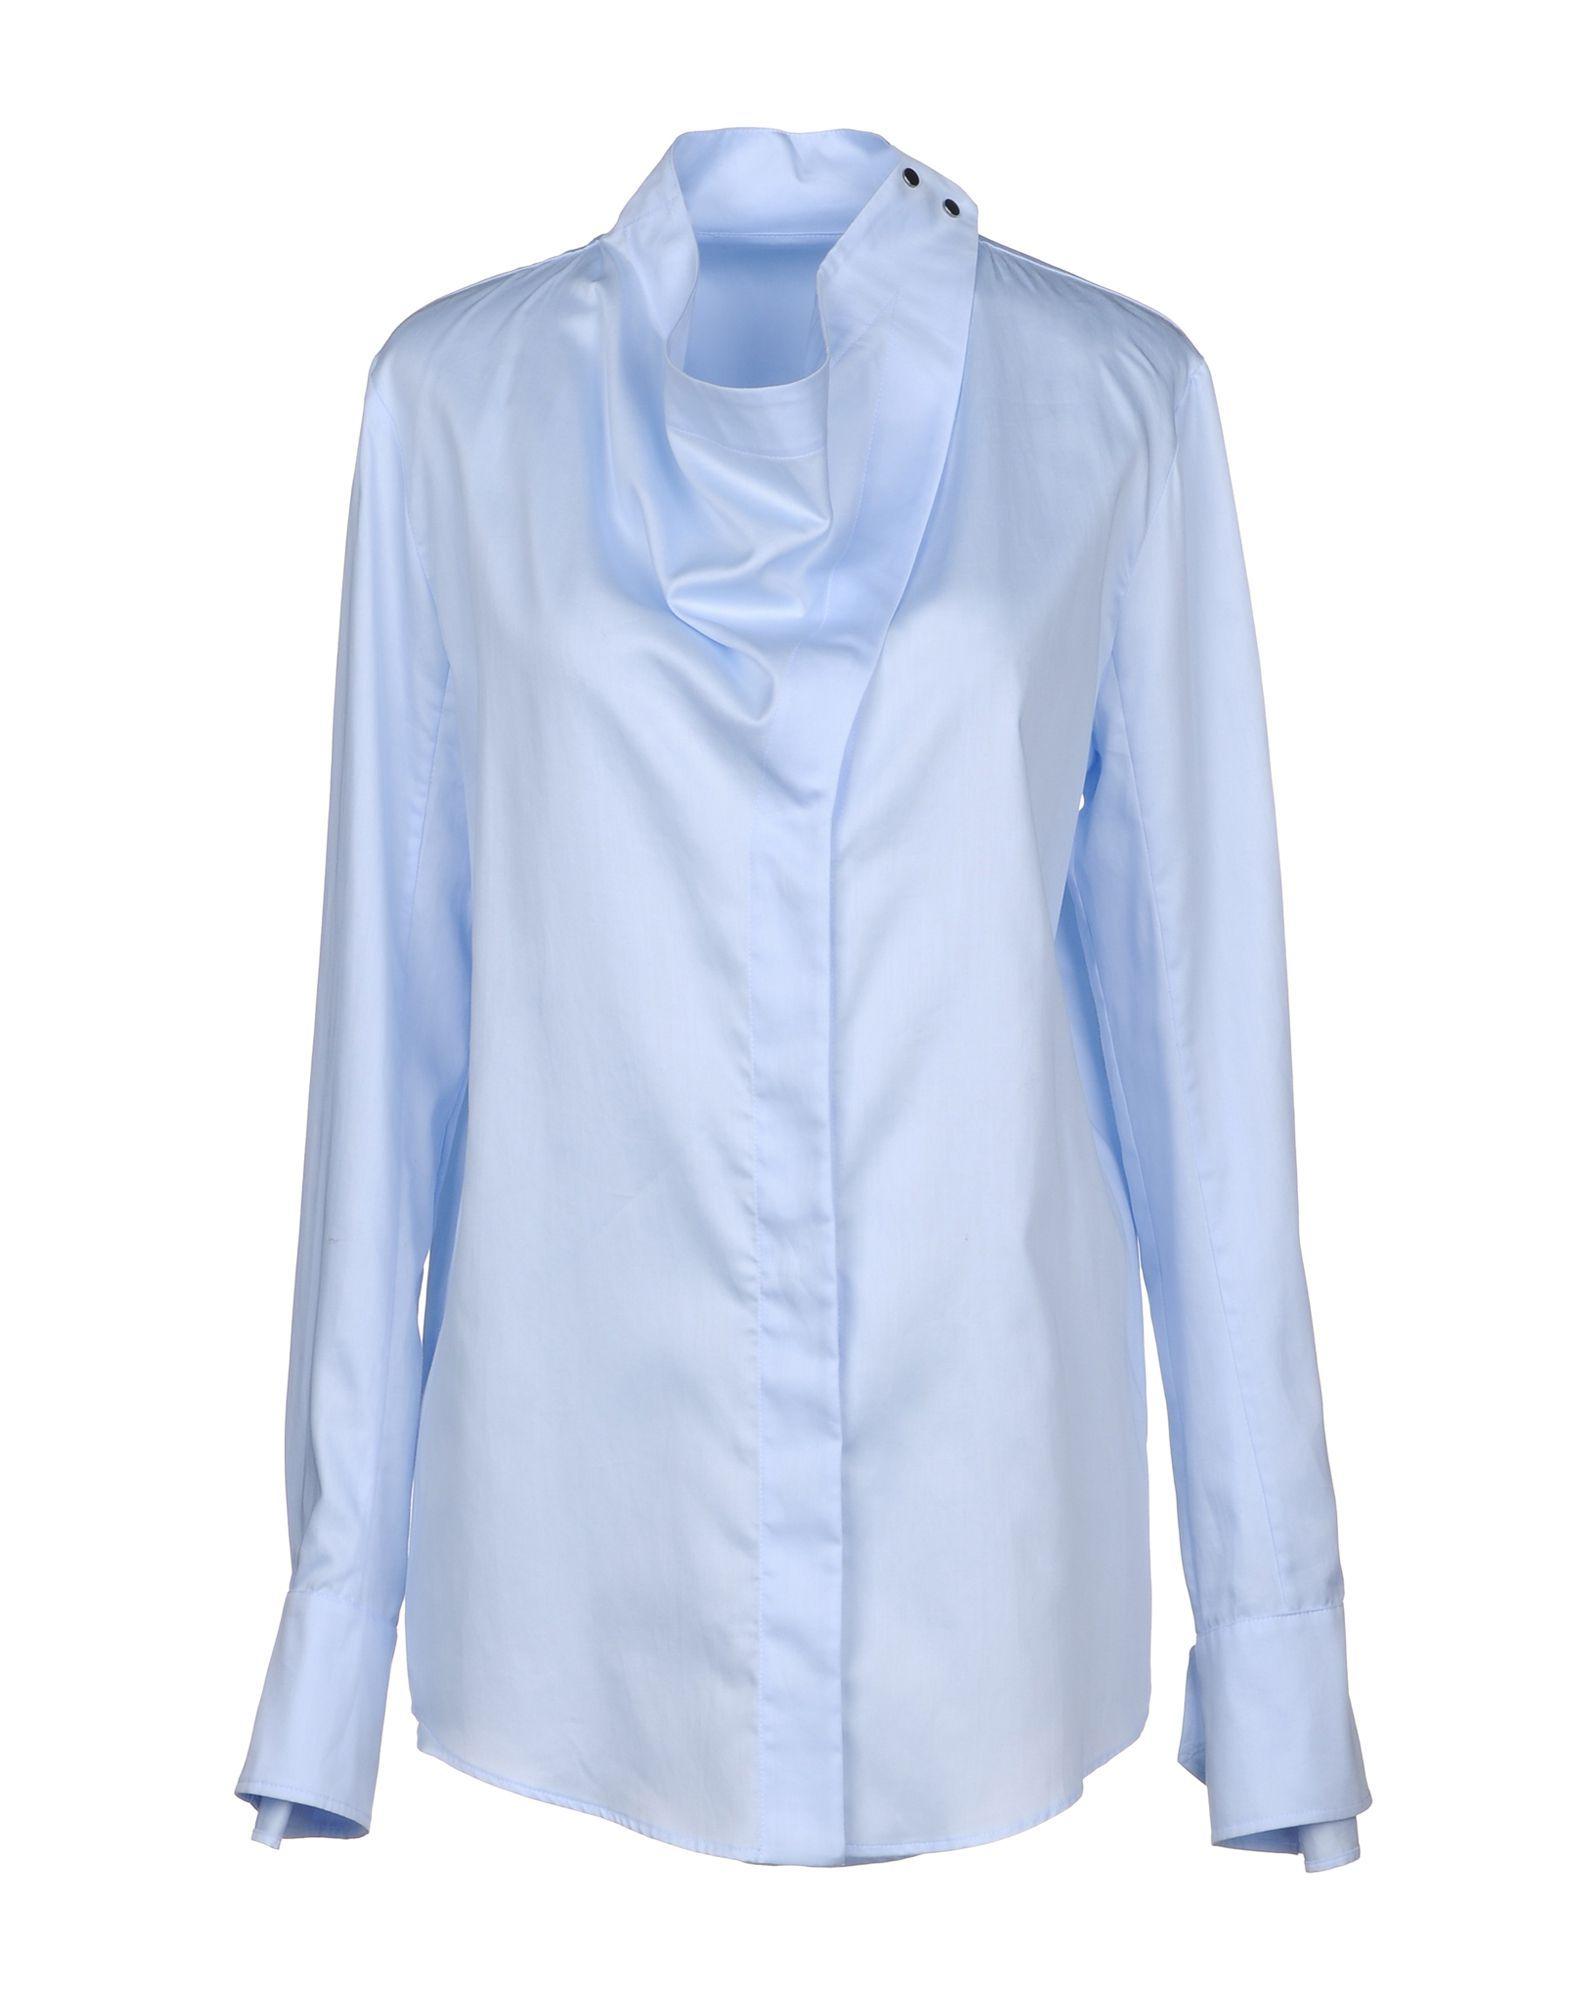 Stella McCartney Sky Blue Cotton Shirt